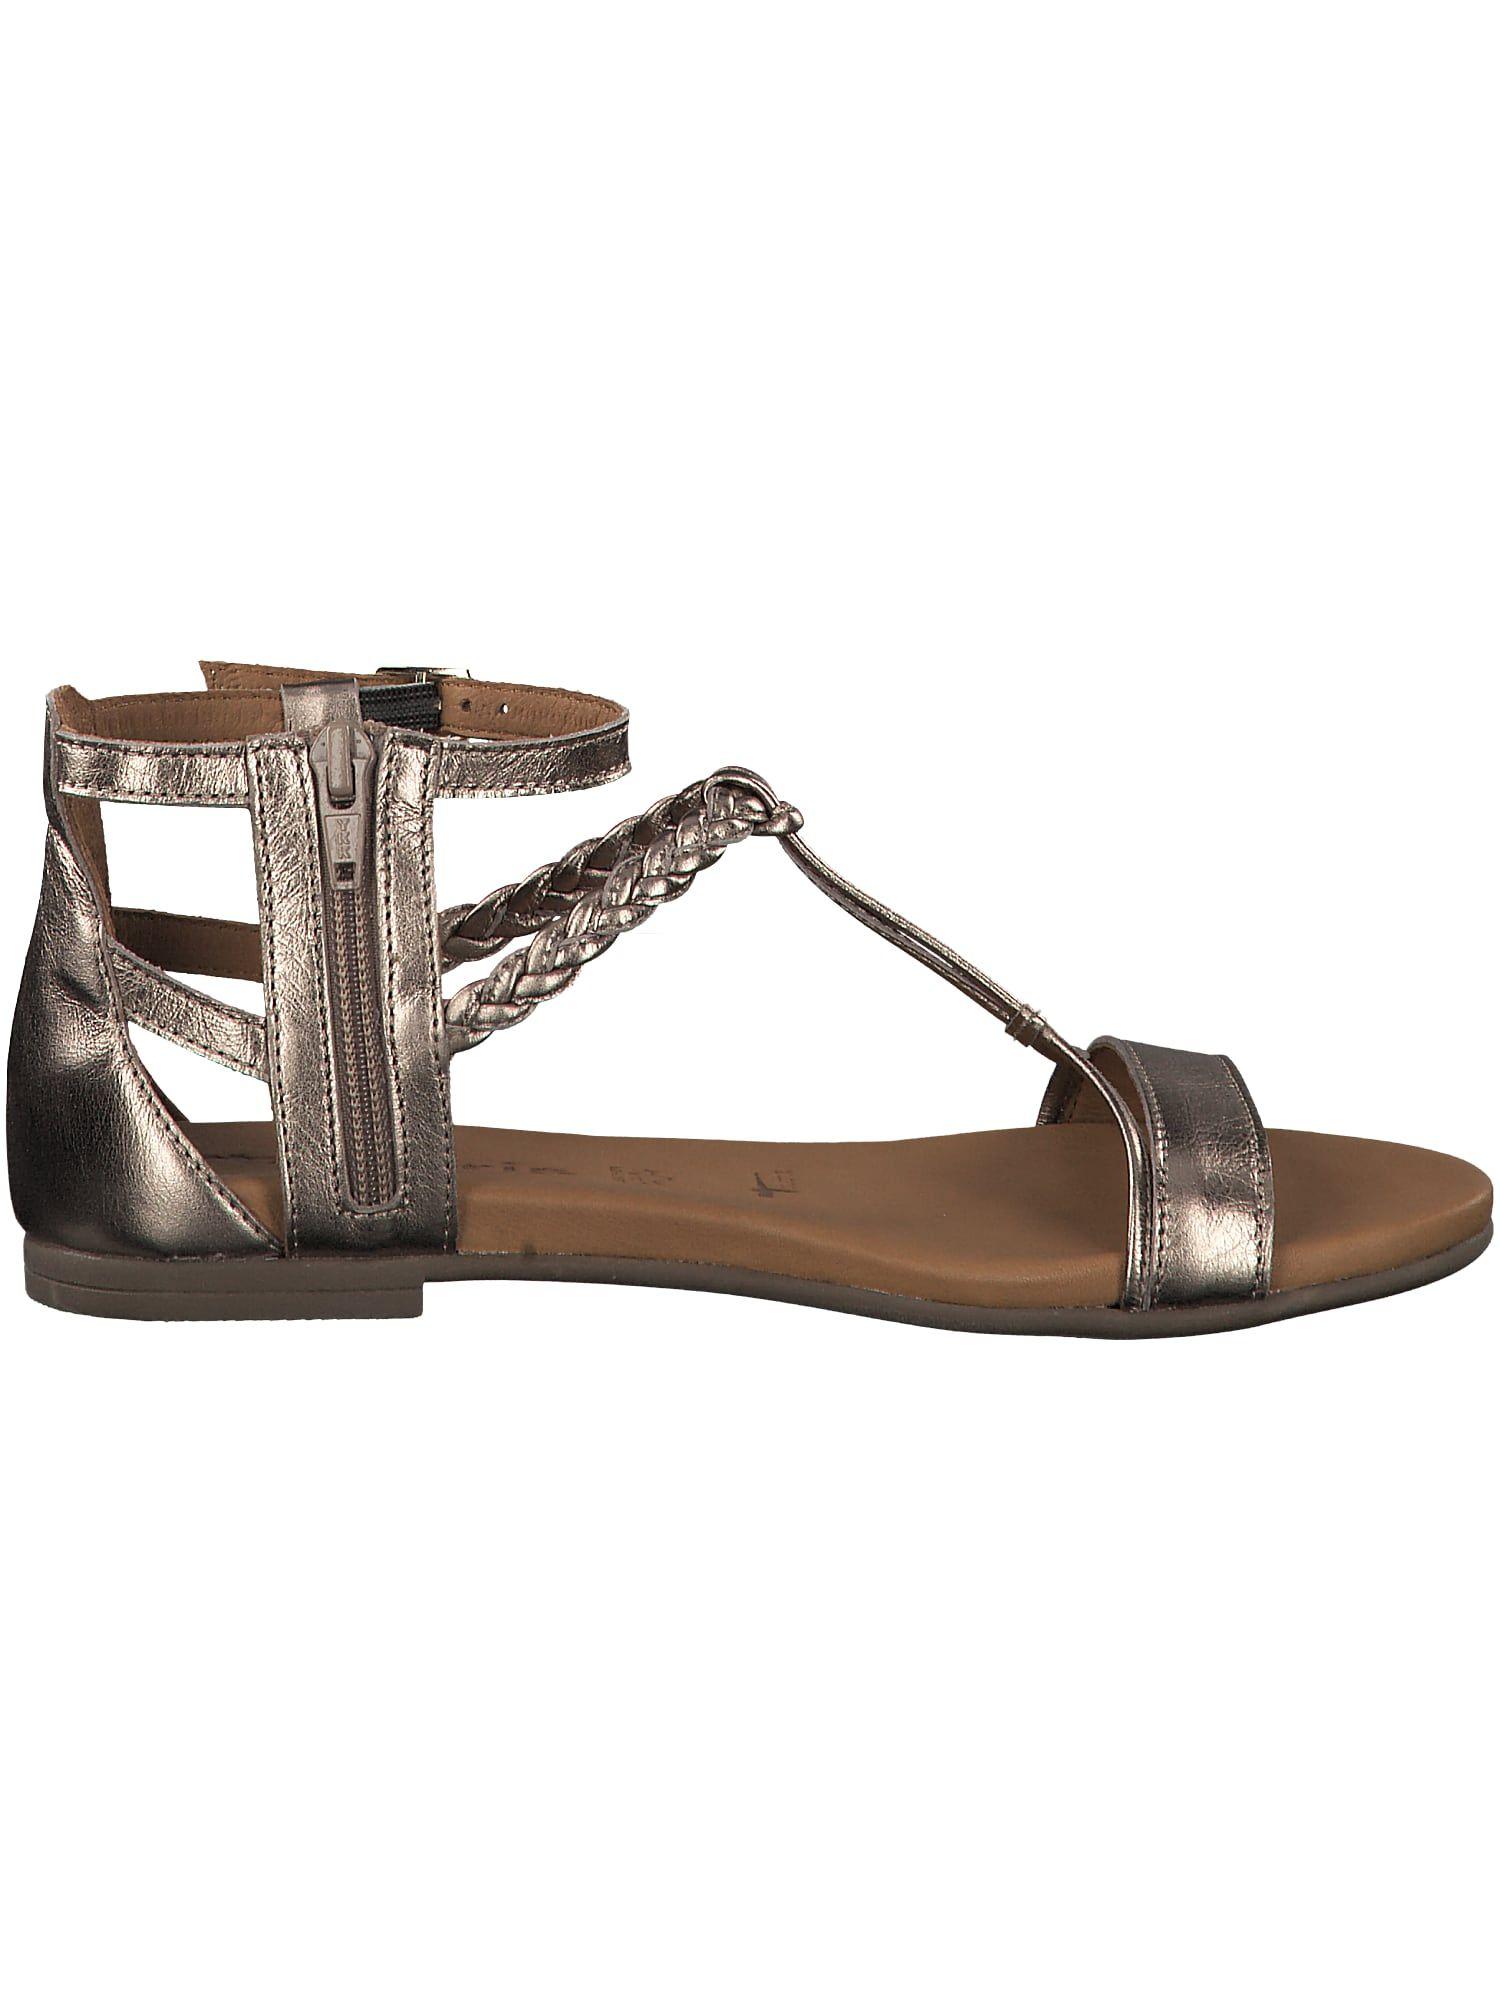 TAMARIS Sandale Damen, Champagner Silber, Größe 42